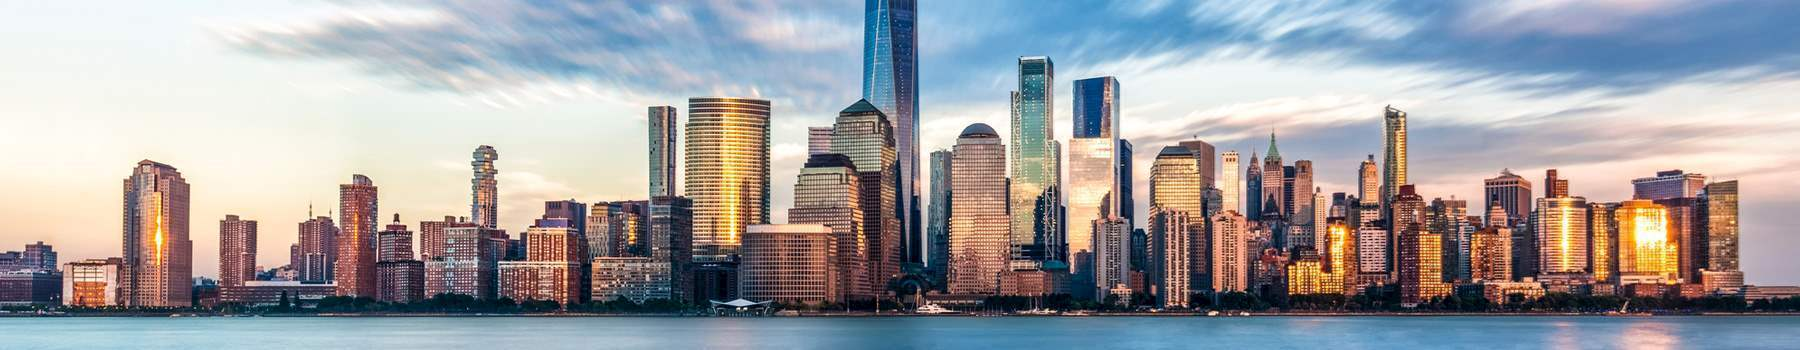 Newyork Rockefeller Center top